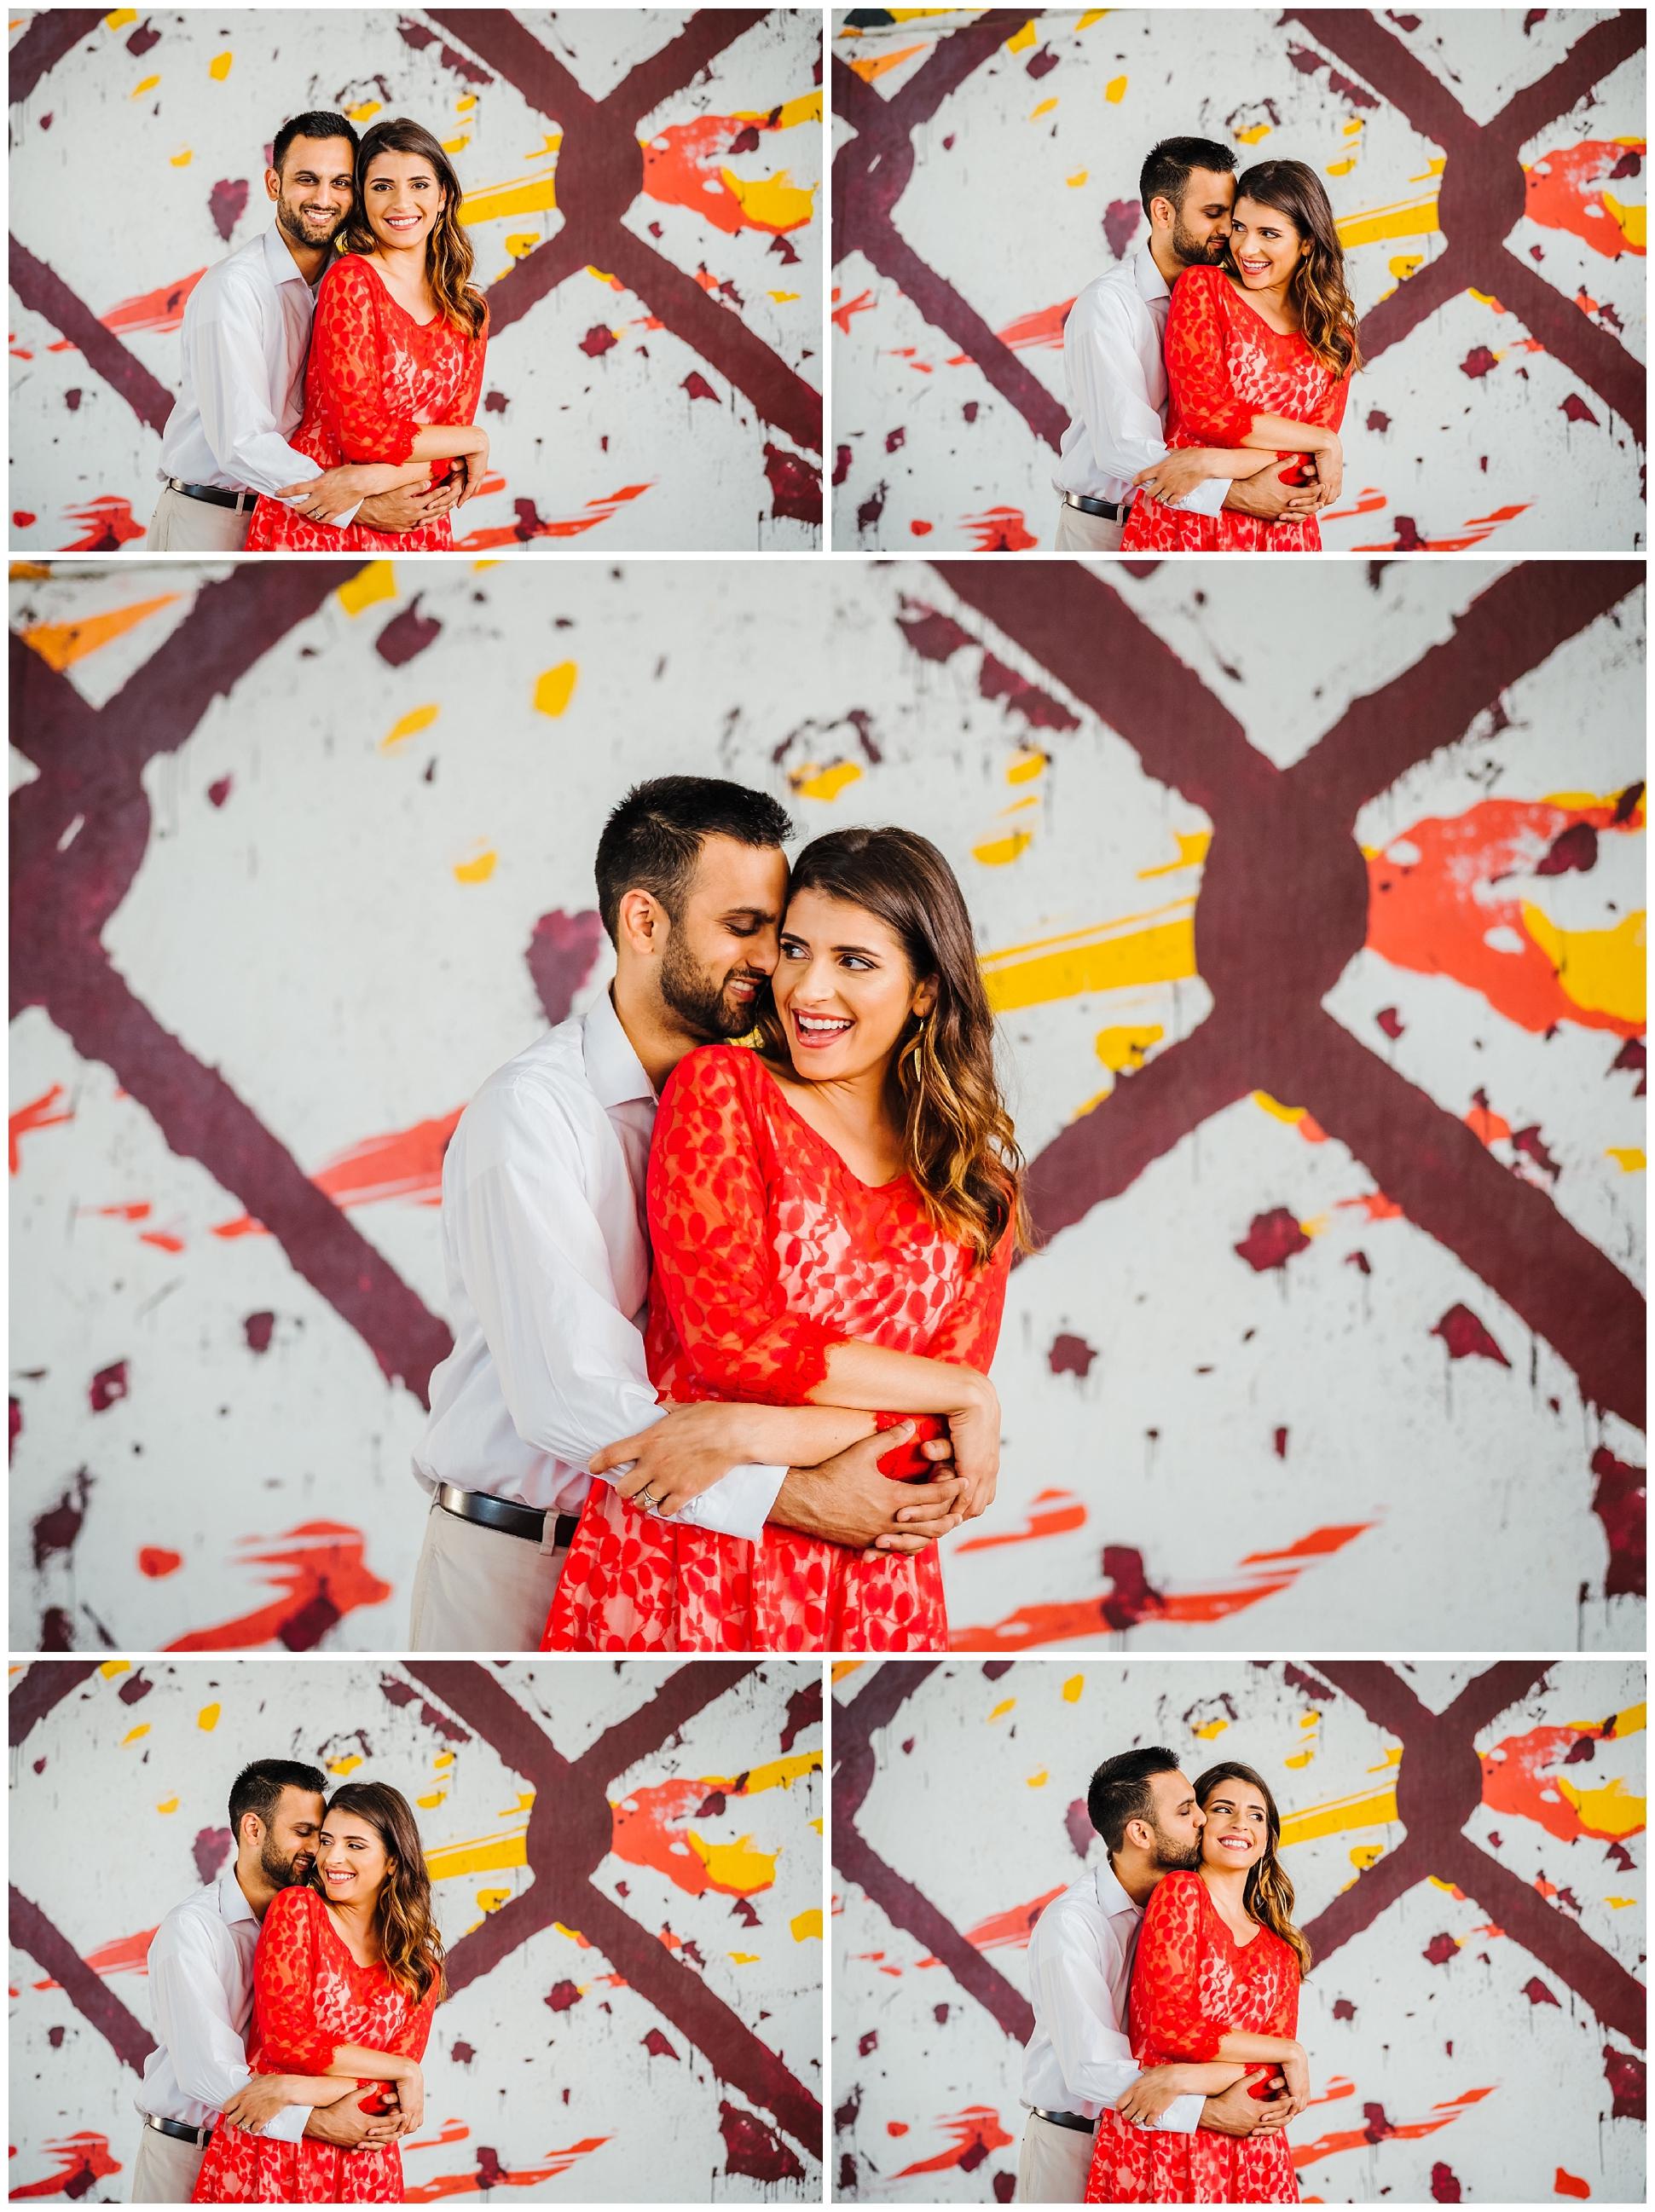 -tampa-st-pete-wedding-portrait-studio-photographer-colorful-vibrant-creative_0102.jpg